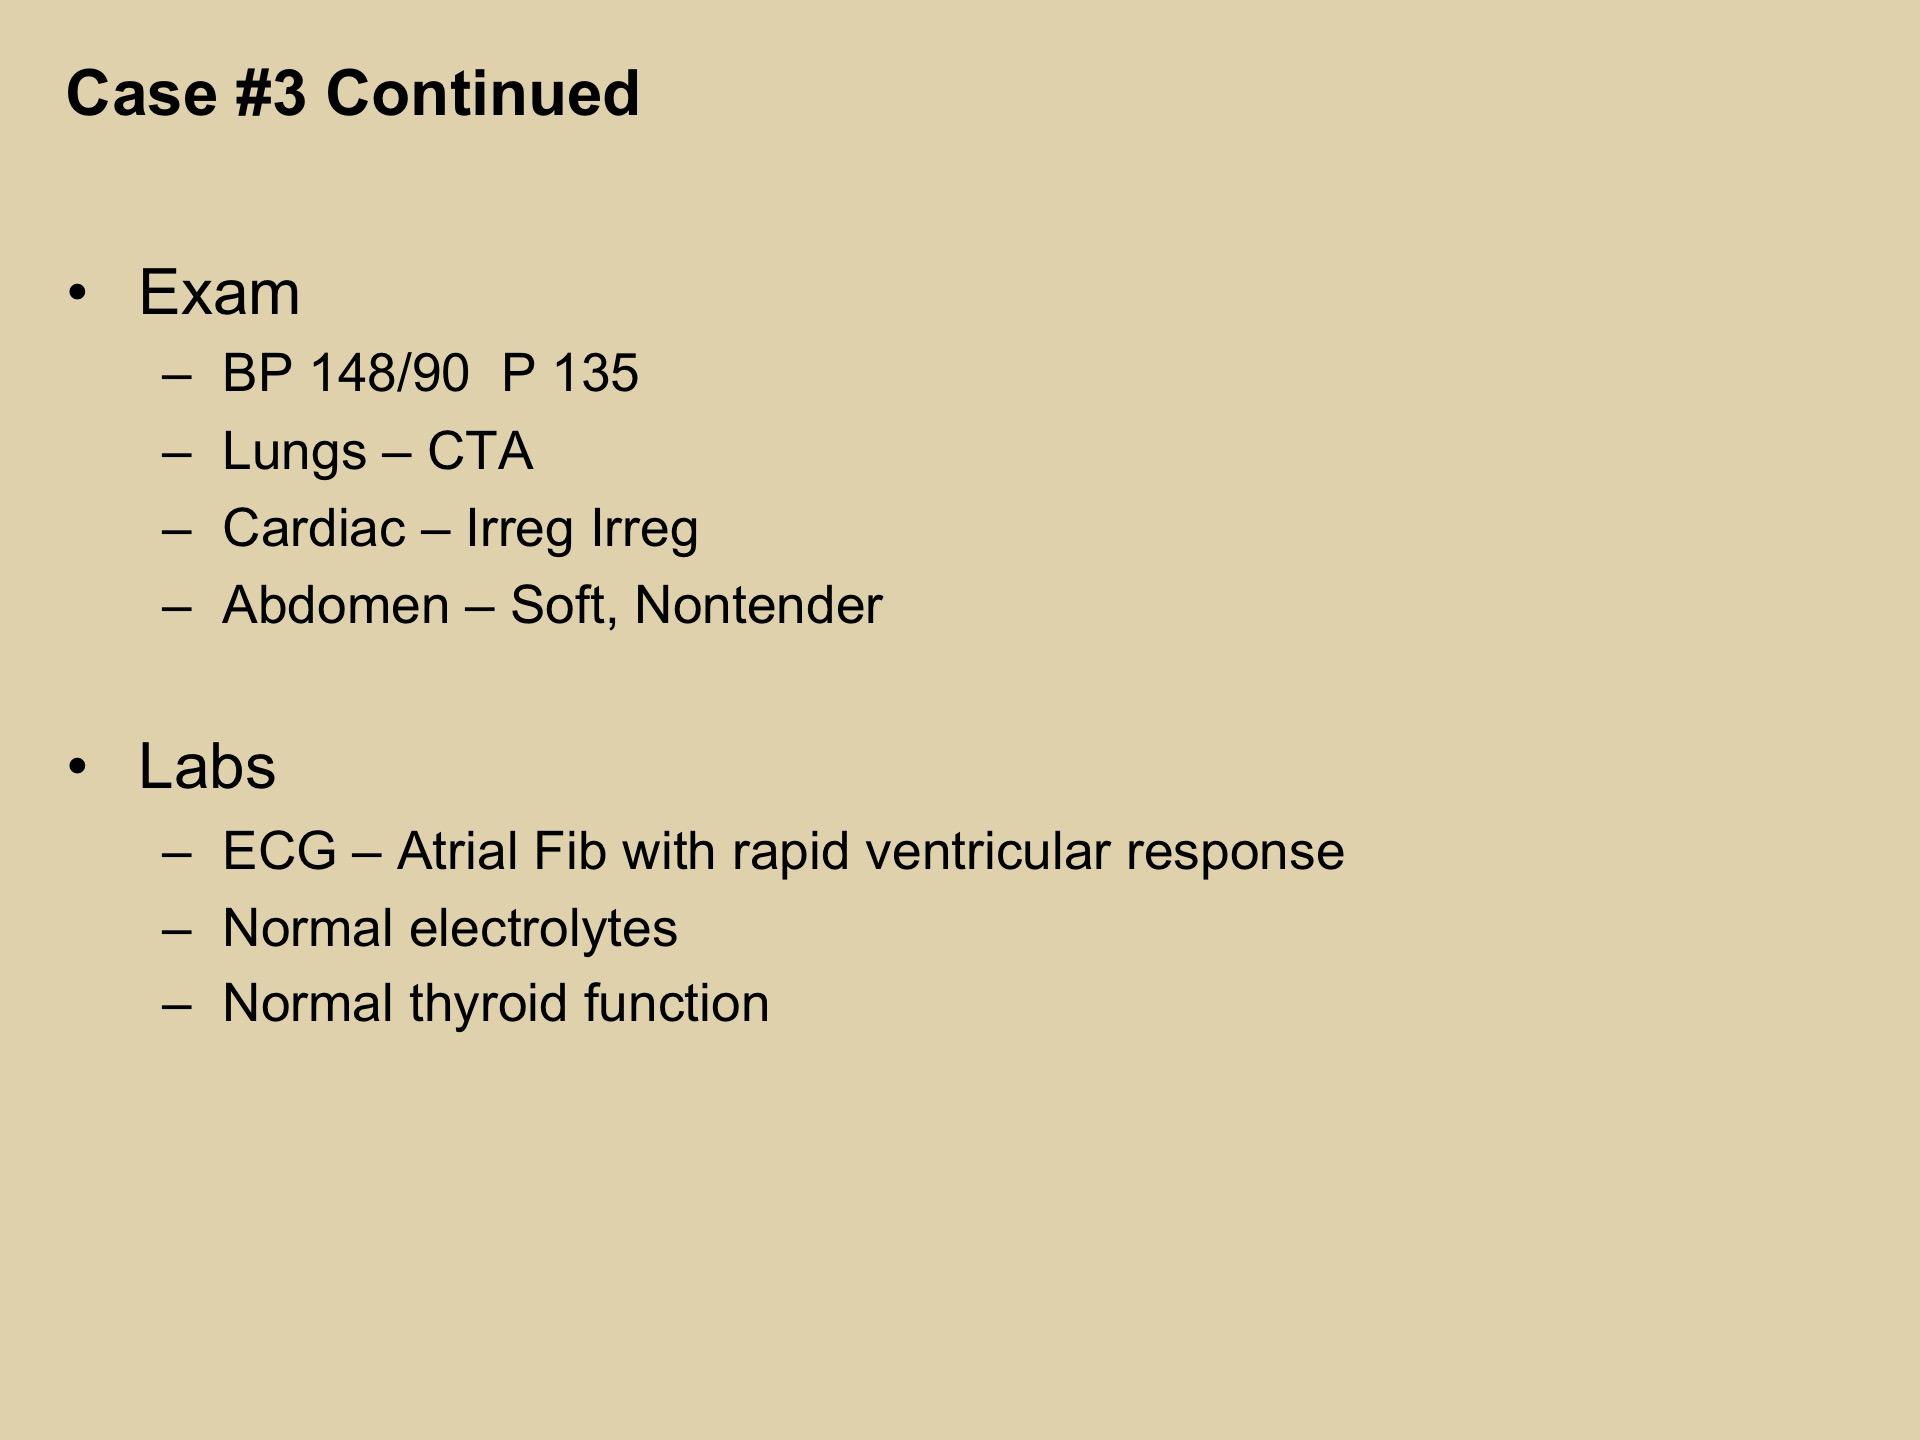 Treatment of Atrial Fibrillation: Rate vs  Rhythm Control | UPMC